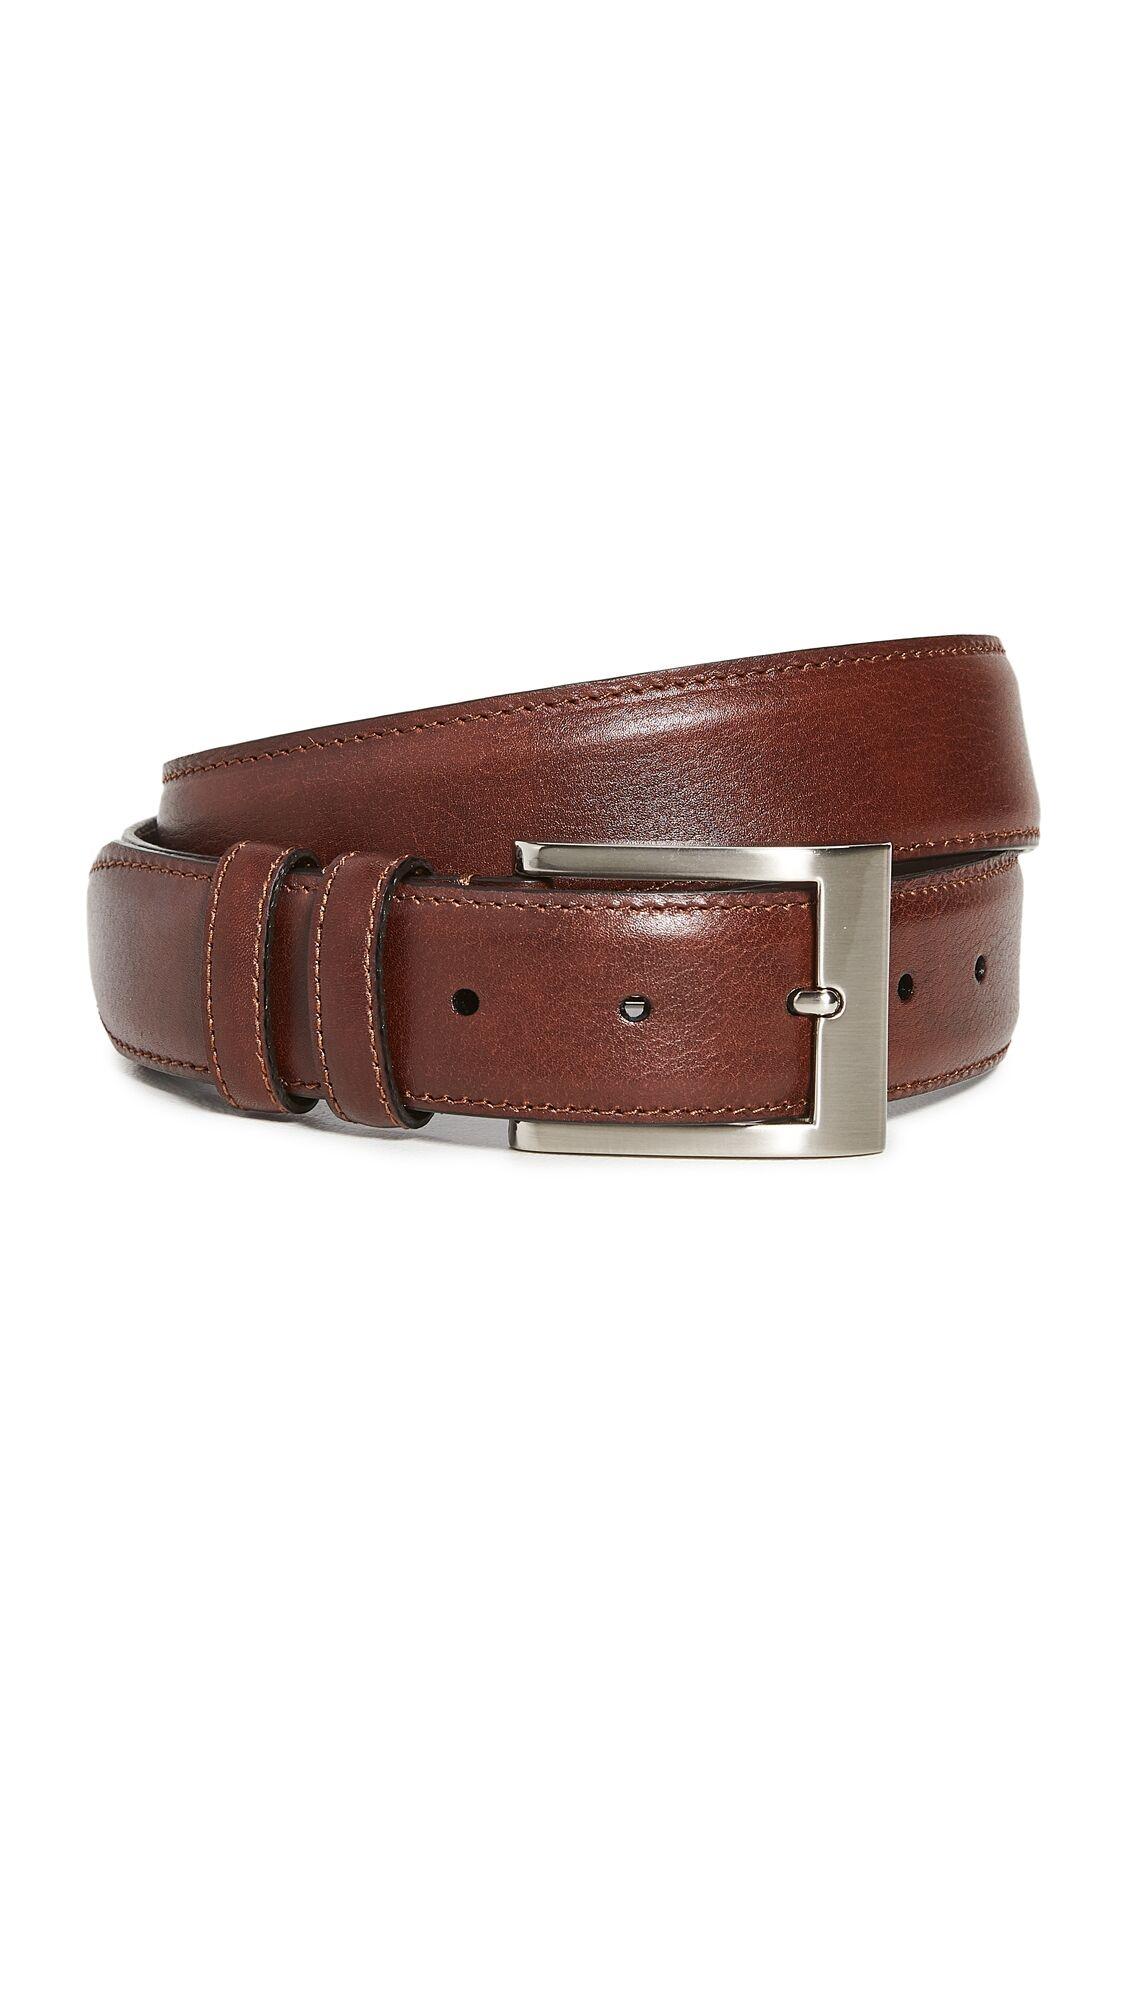 Allen Edmonds Wide Basic Belt - Chili - Size: 42